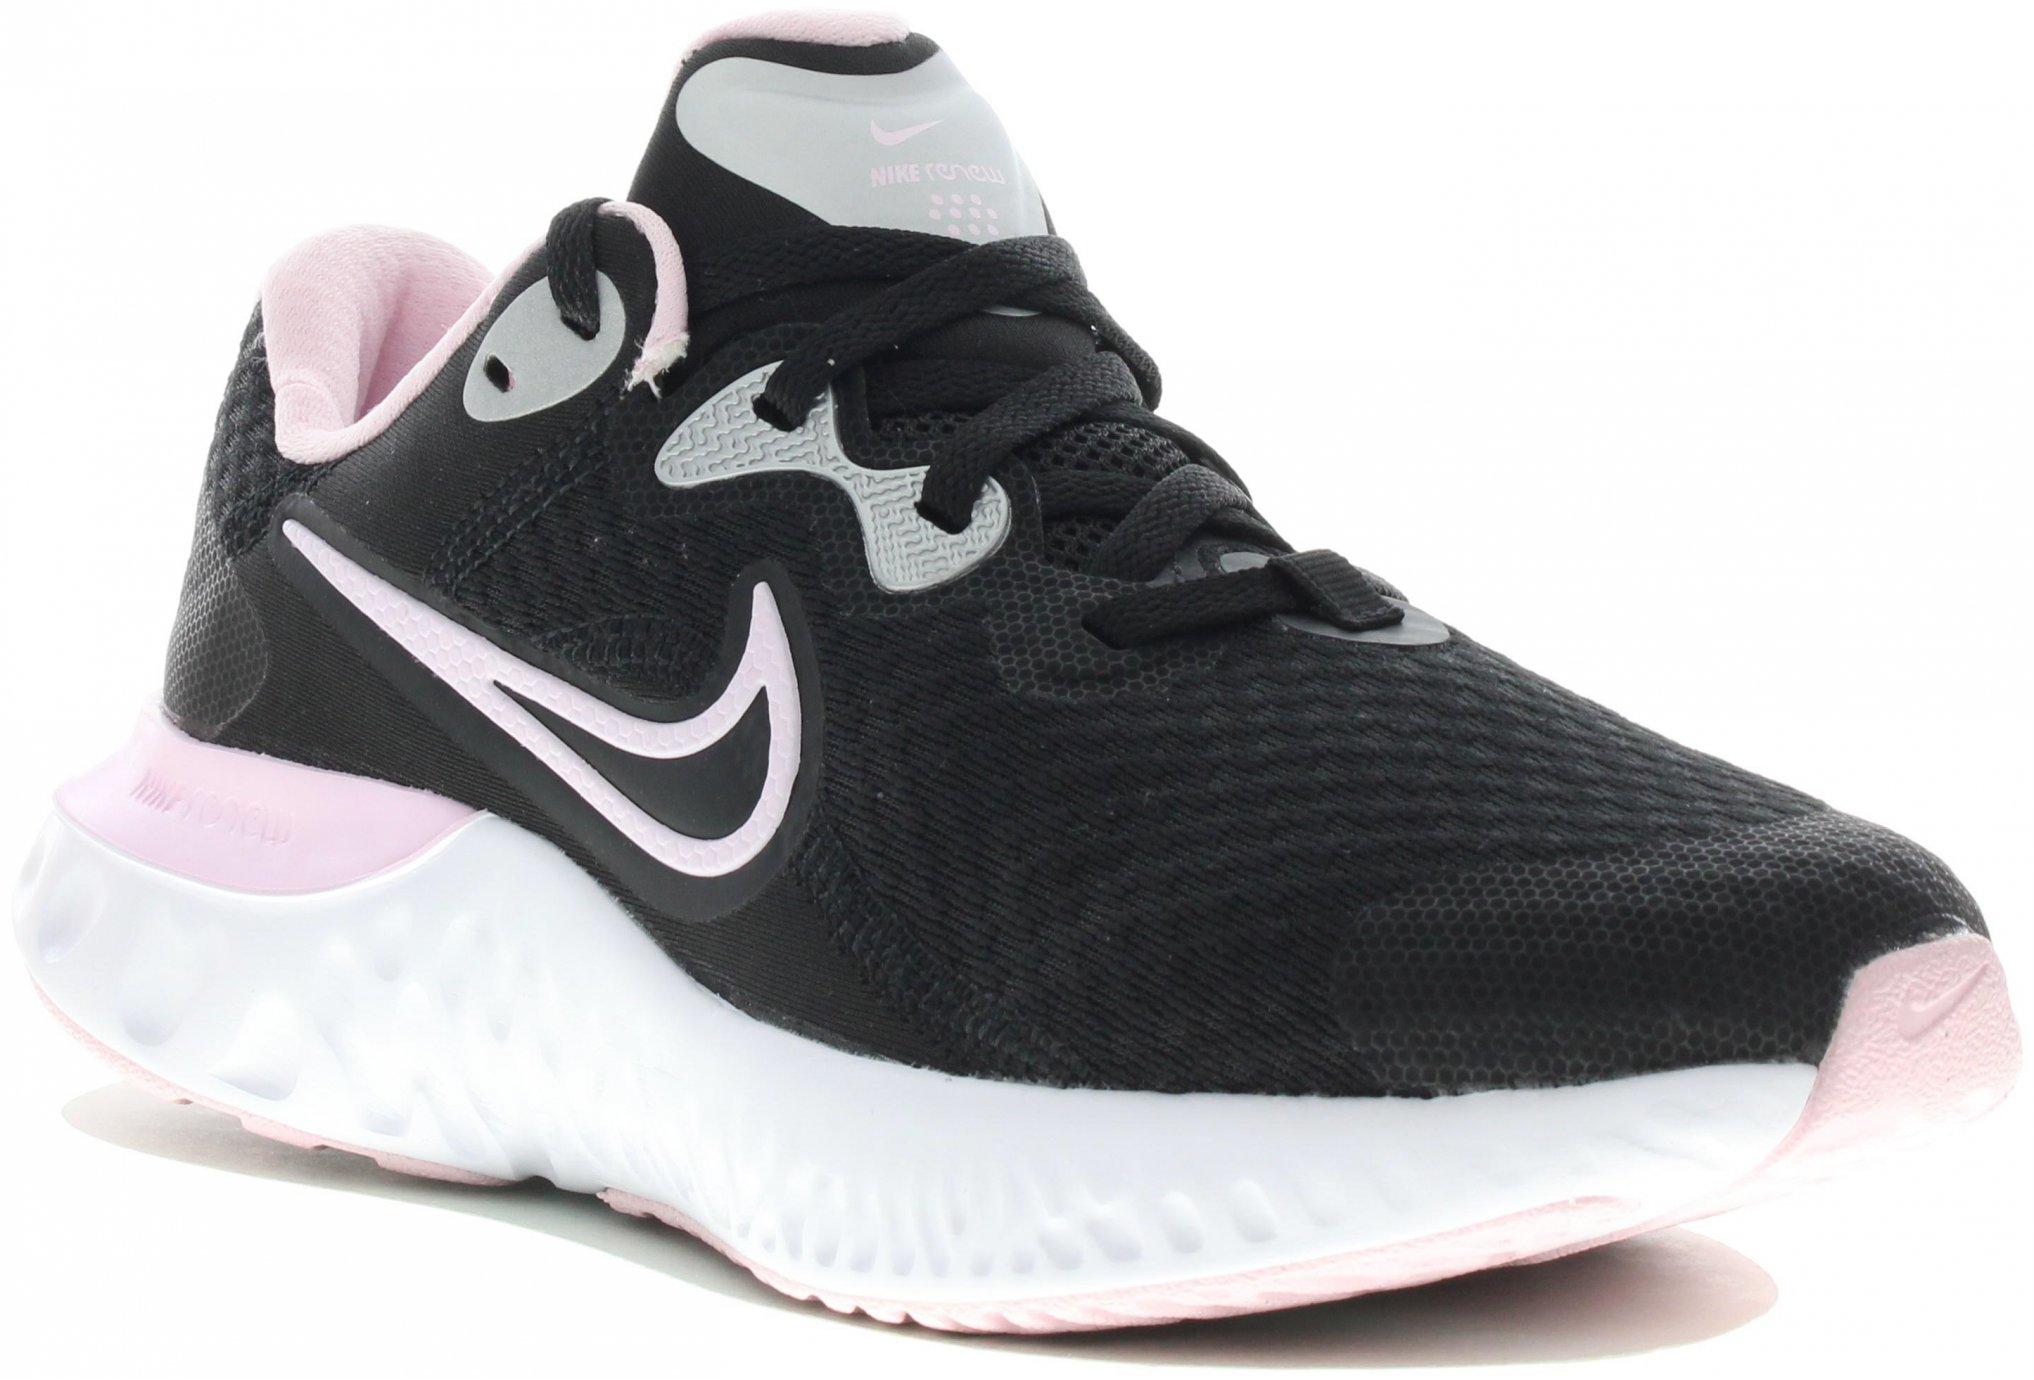 Nike Renew Run 2 Fille Chaussures running femme